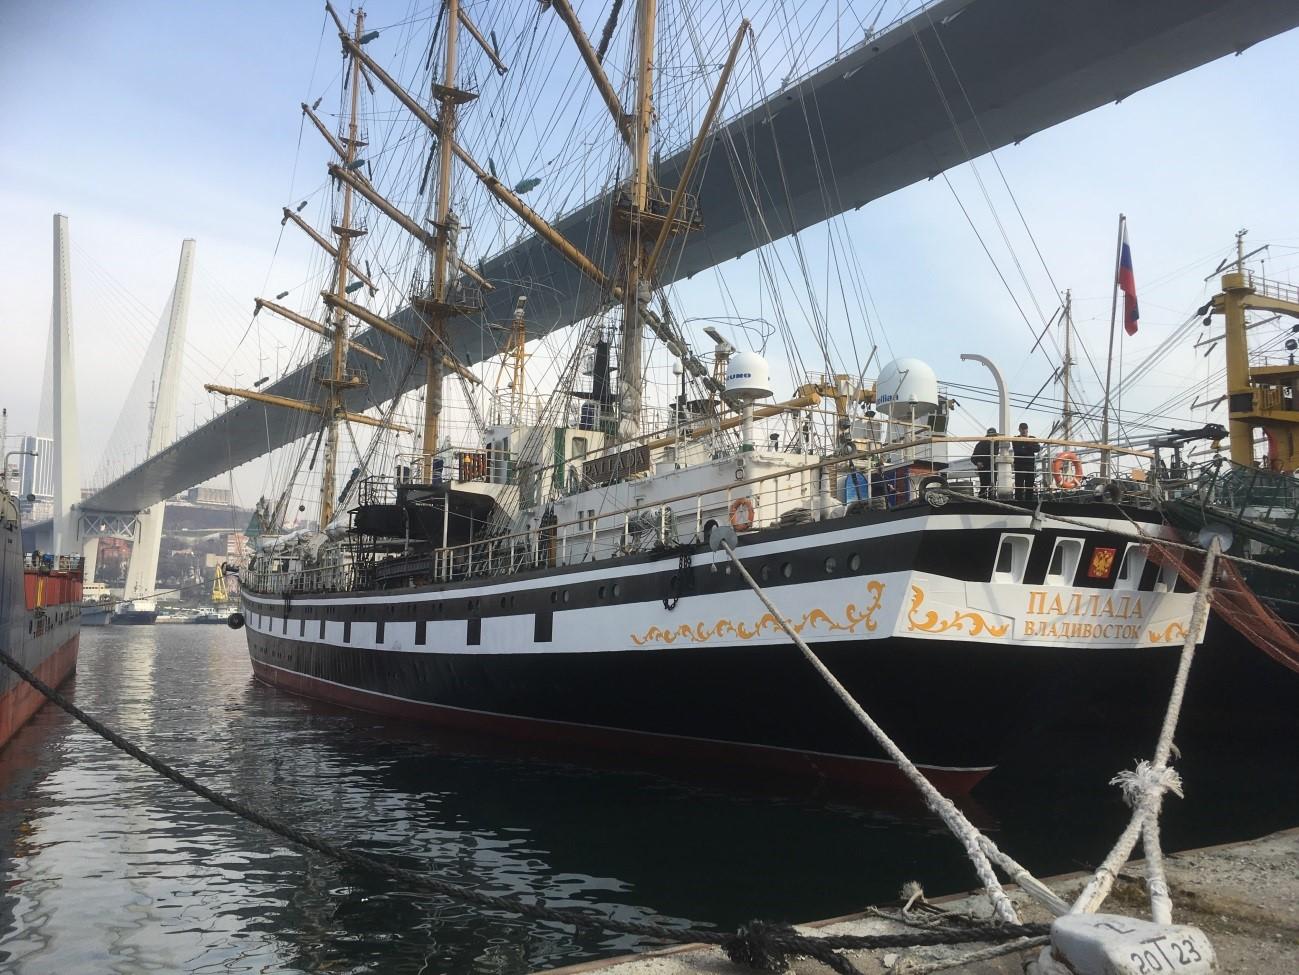 FESTFUが所有する練習帆船パラダ号